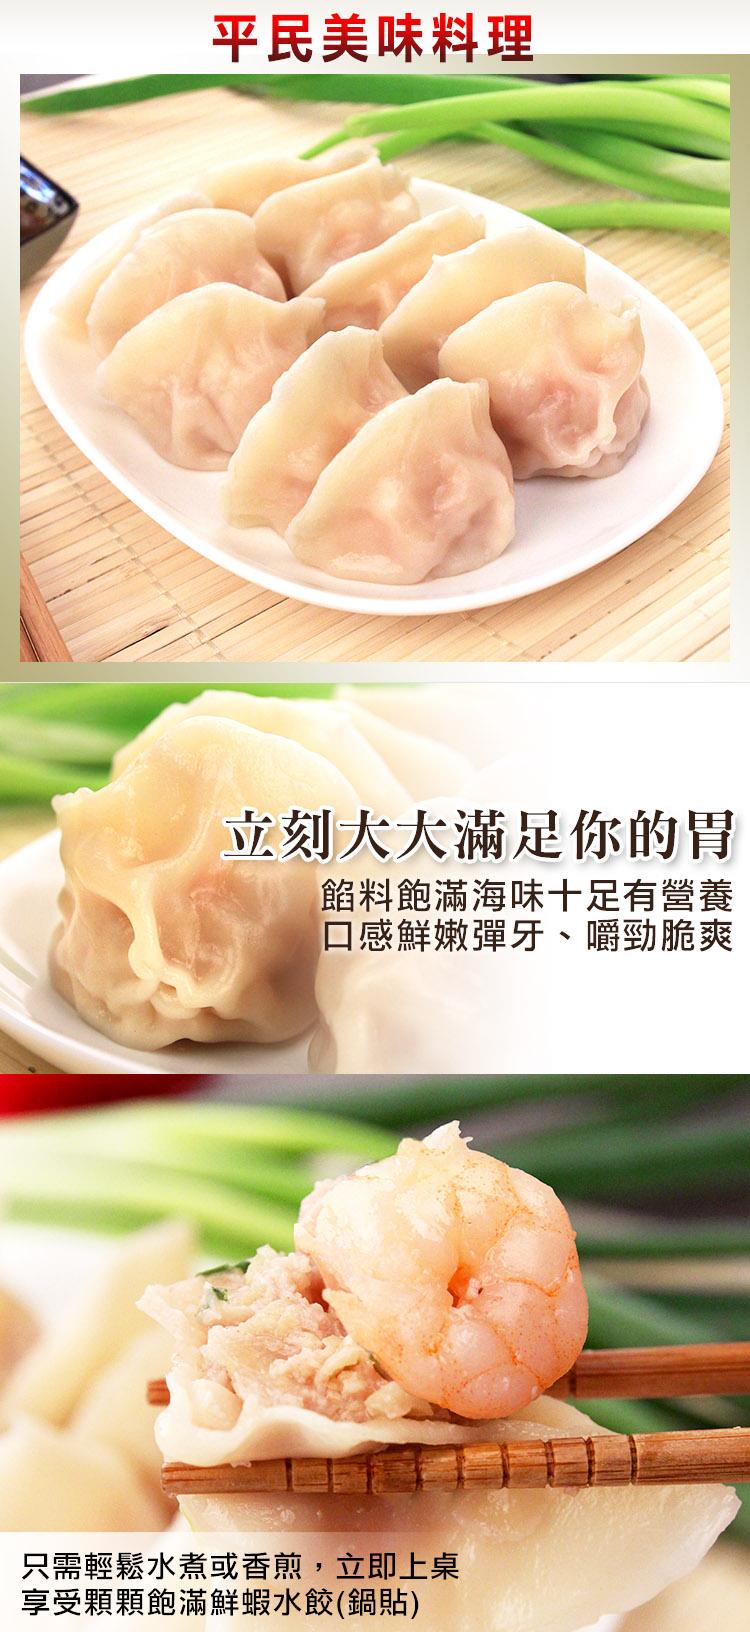 shrimpcabbage10